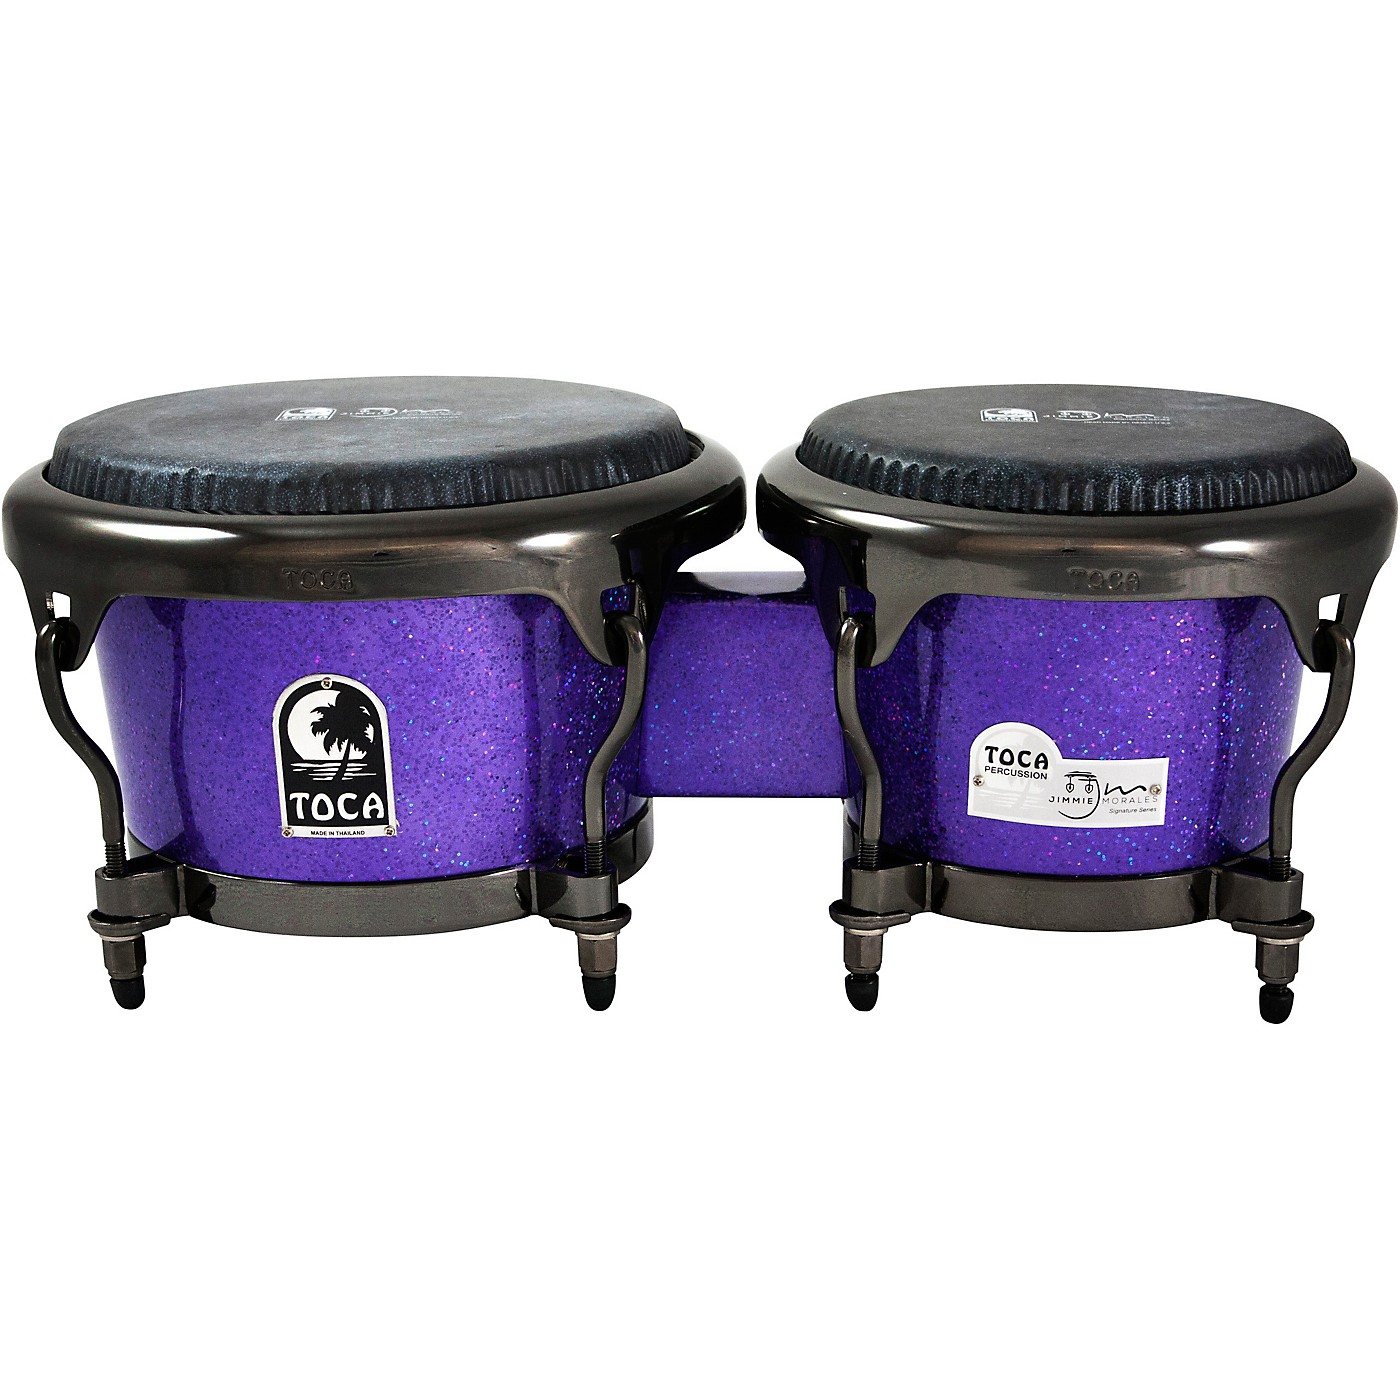 Toca Jimmie Morales Signature Series Purple Sparkle Bongos thumbnail